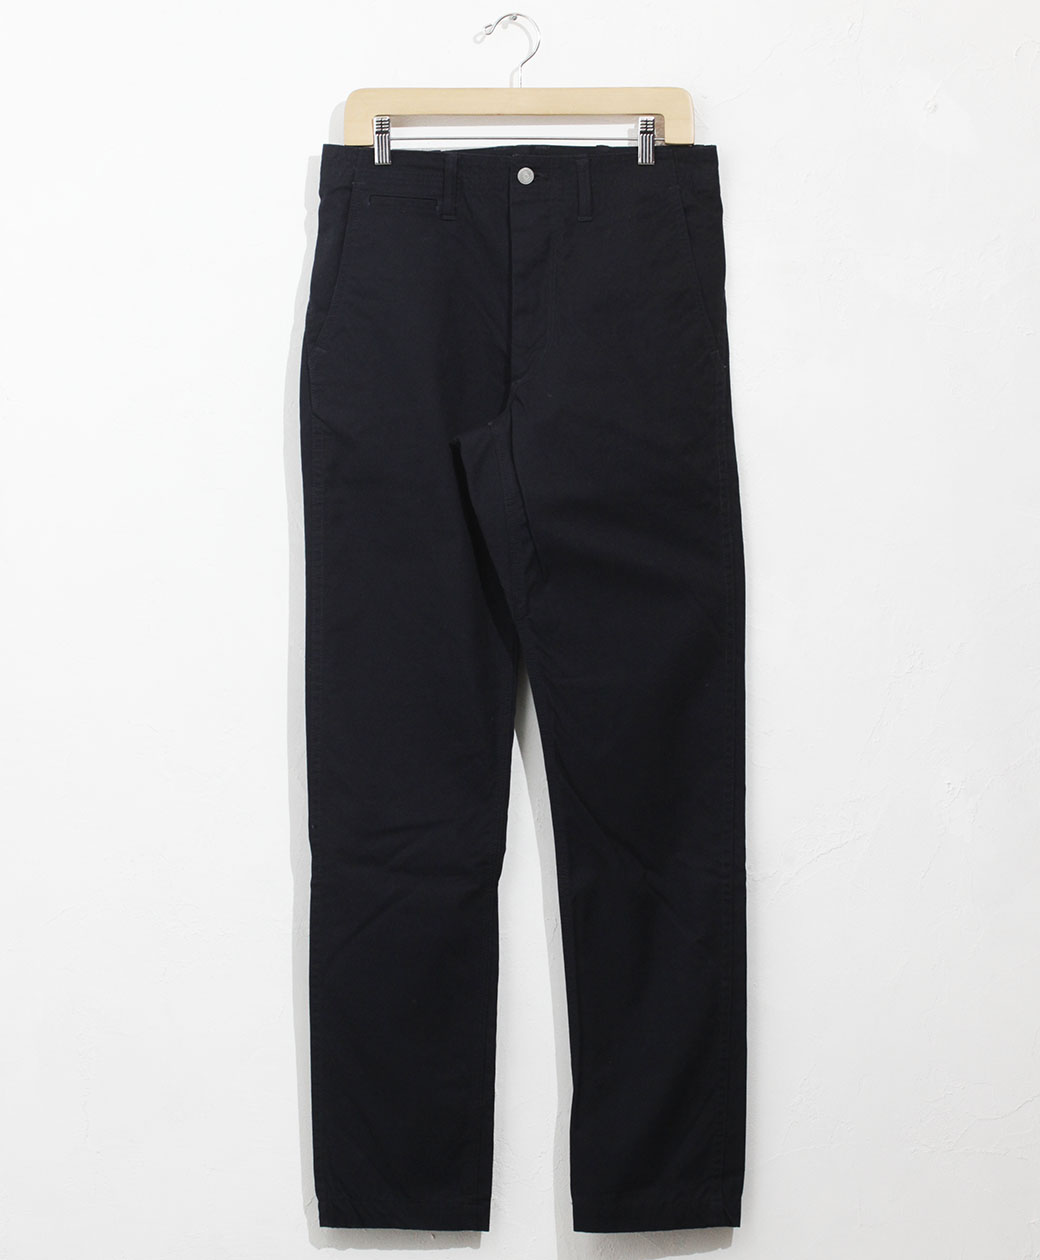 SASSAFRAS Sprayer Pants(Ventile Oxford)